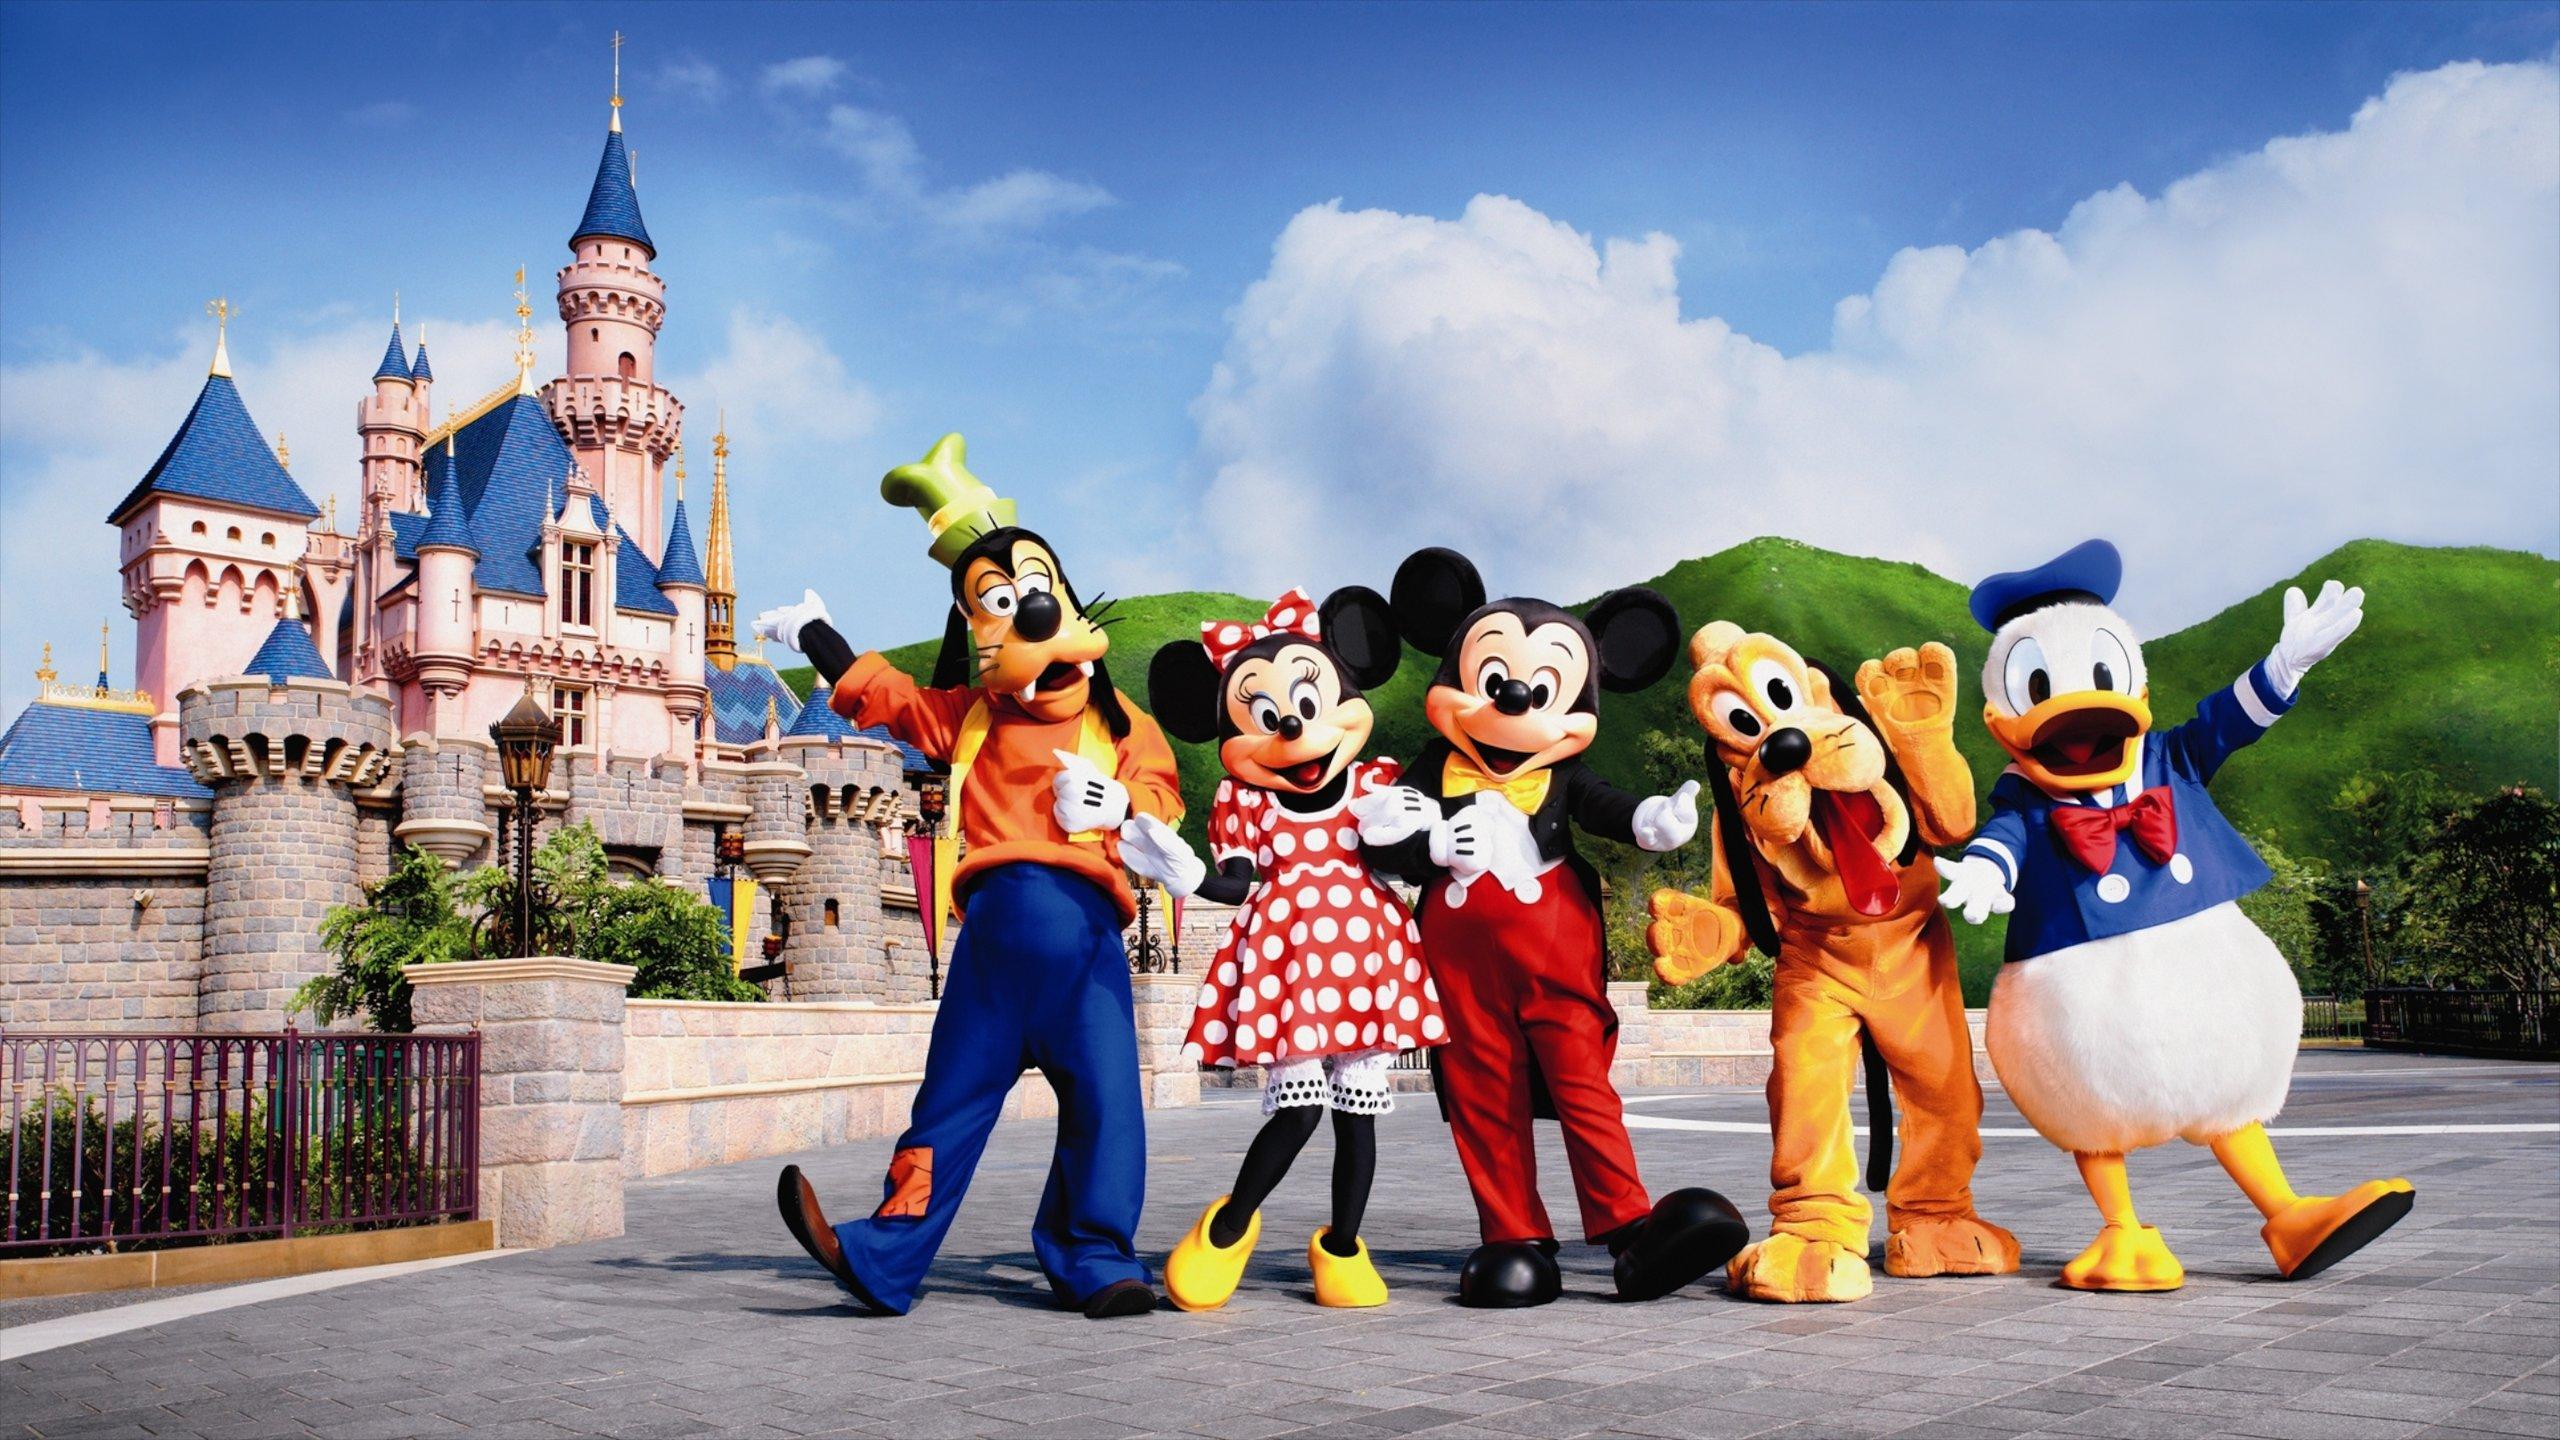 10 Best Hotels Closest To Hong Kong Disneyland In Lantau For